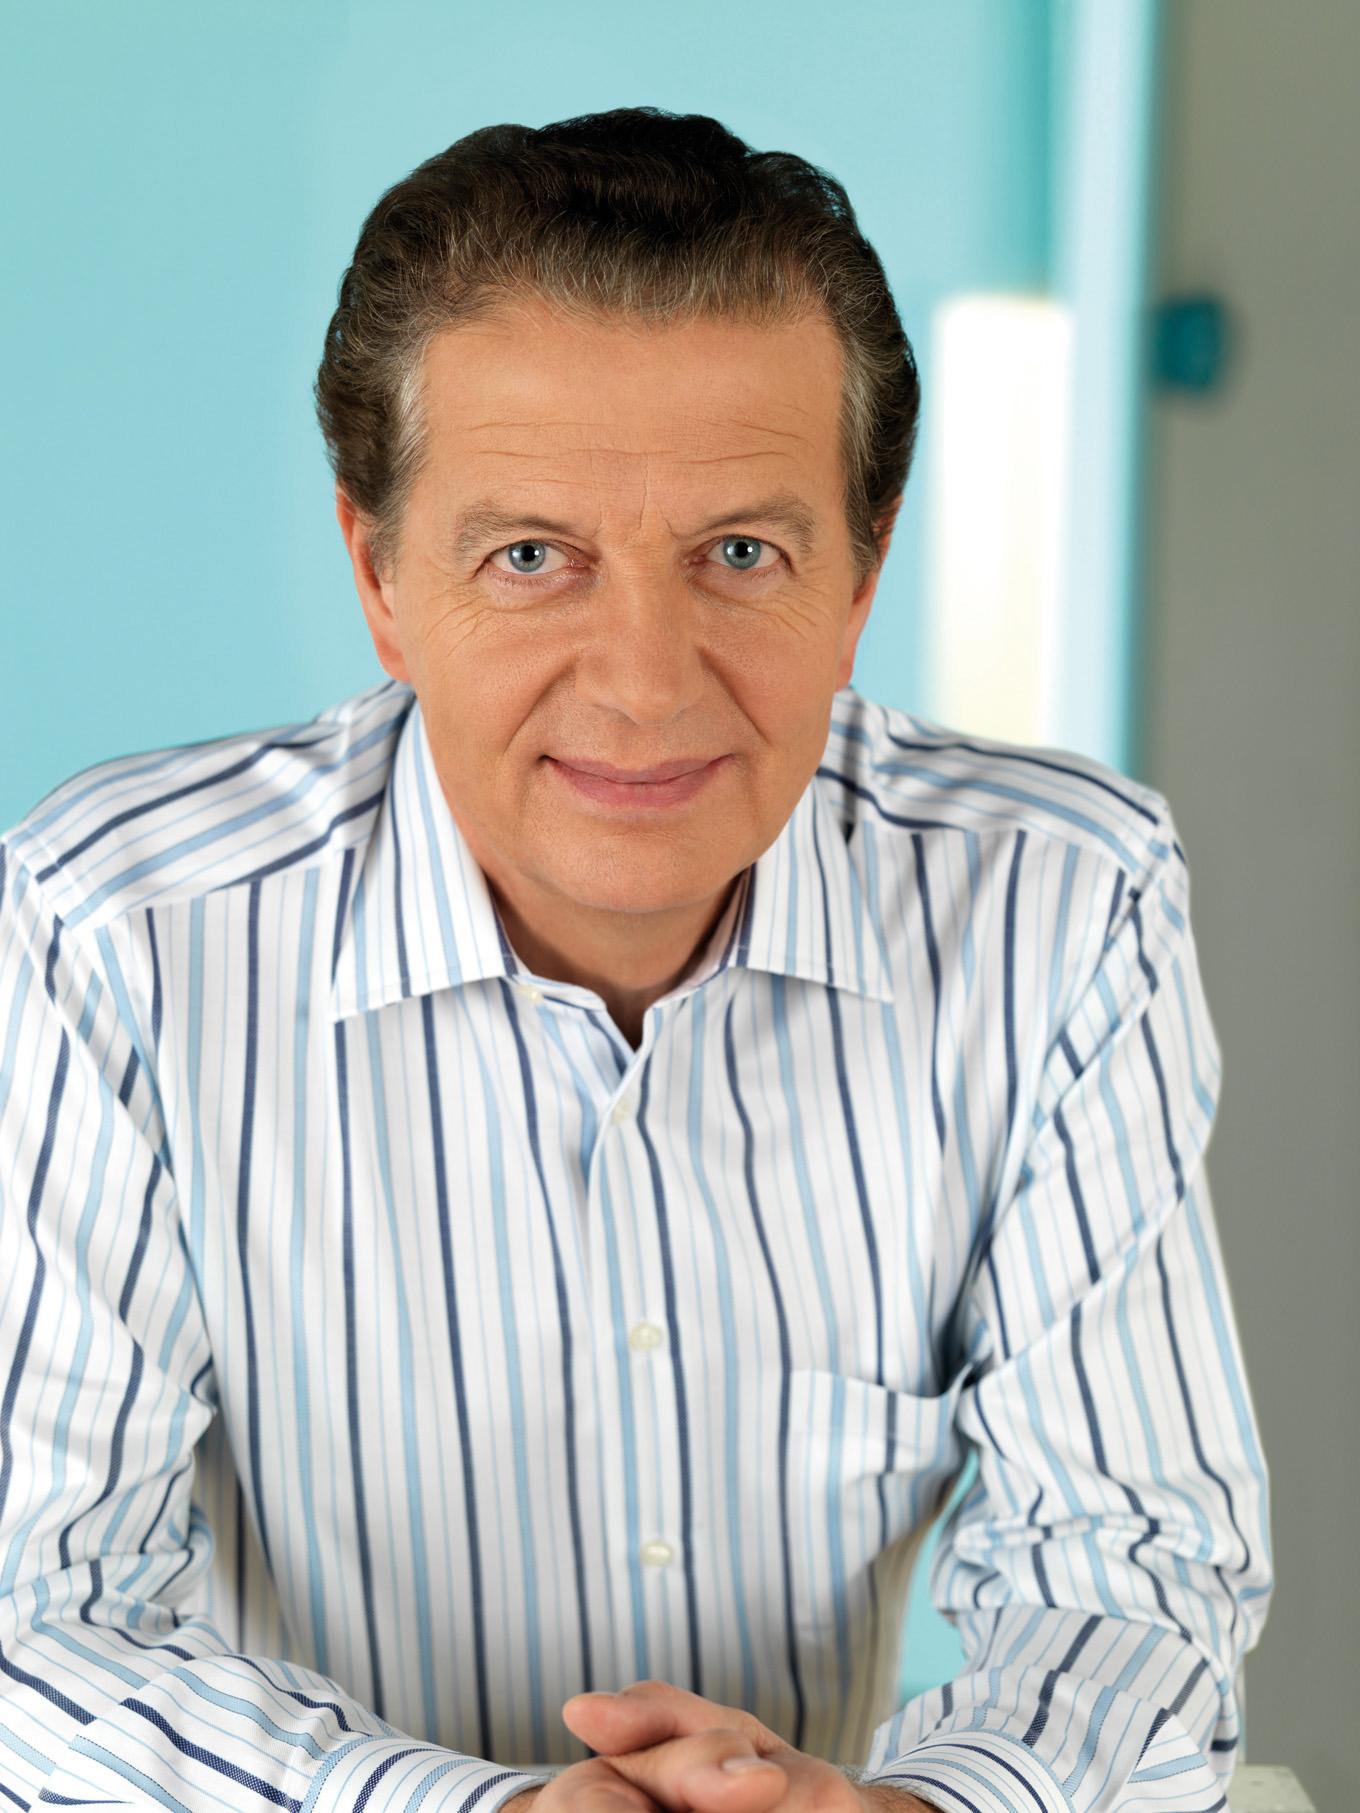 Dominique Perben